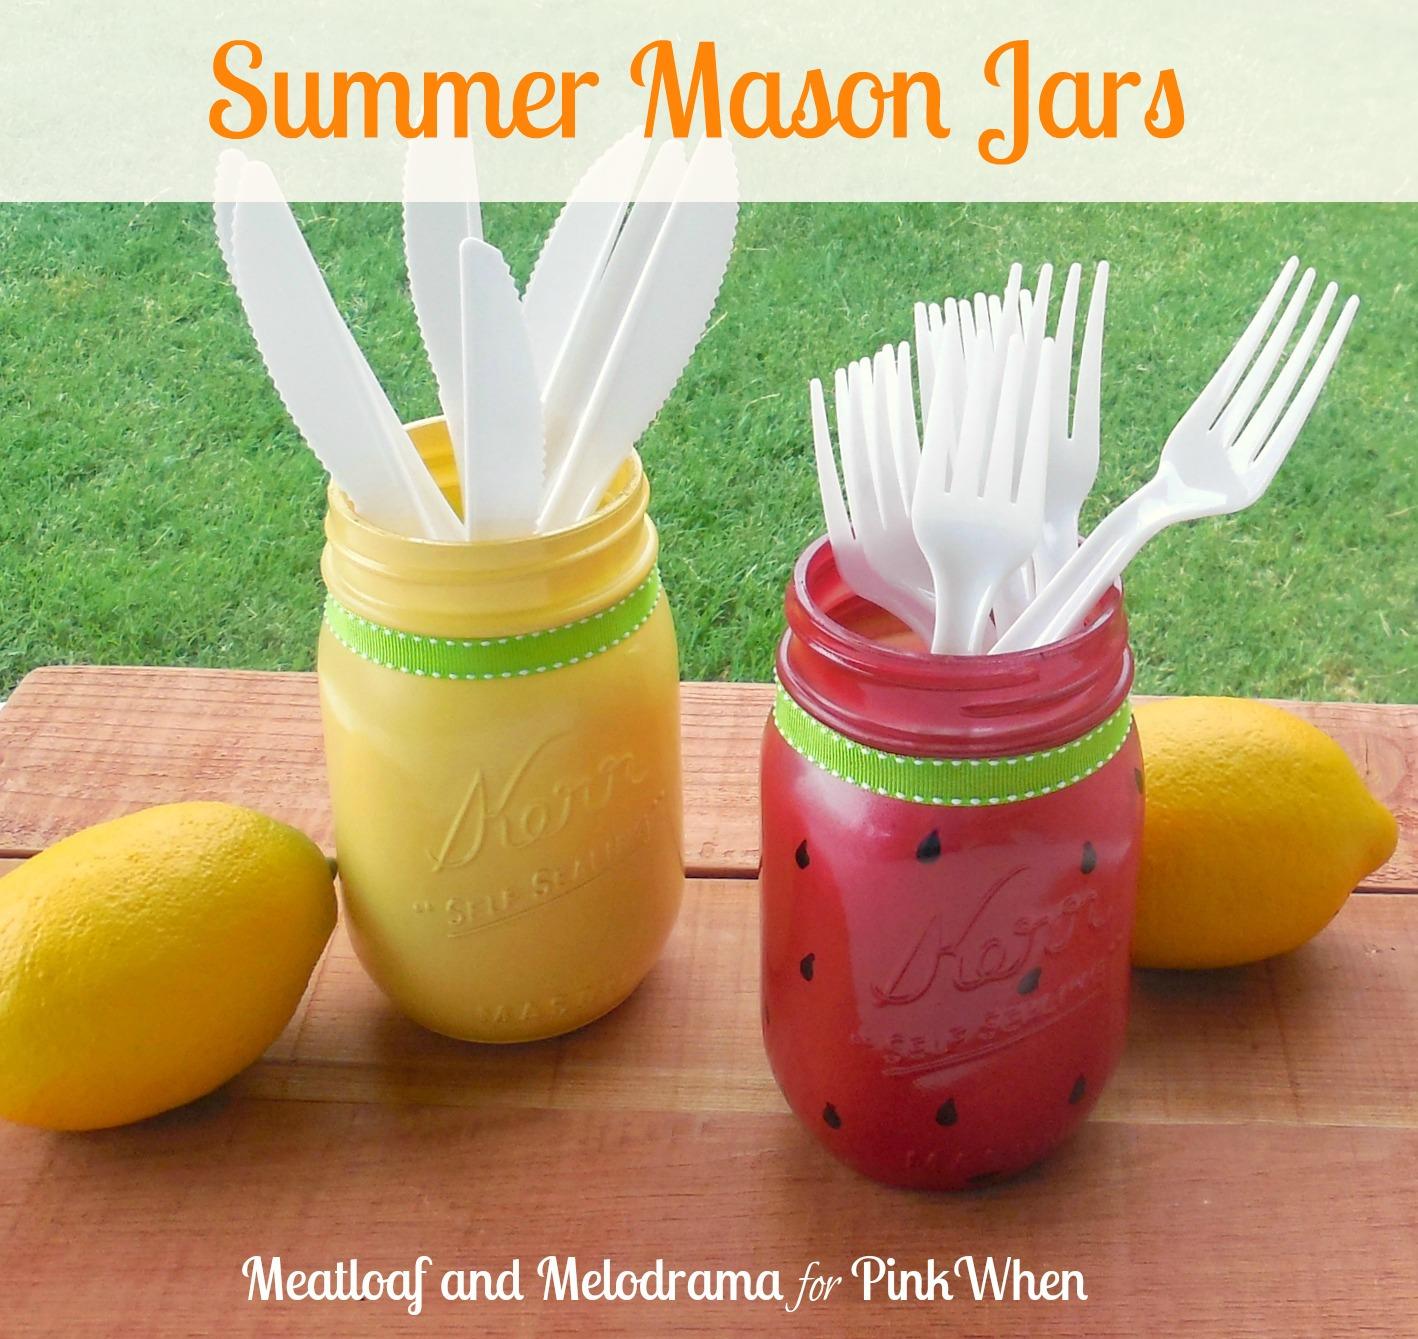 http://www.pinkwhen.com/summer-mason-jars/